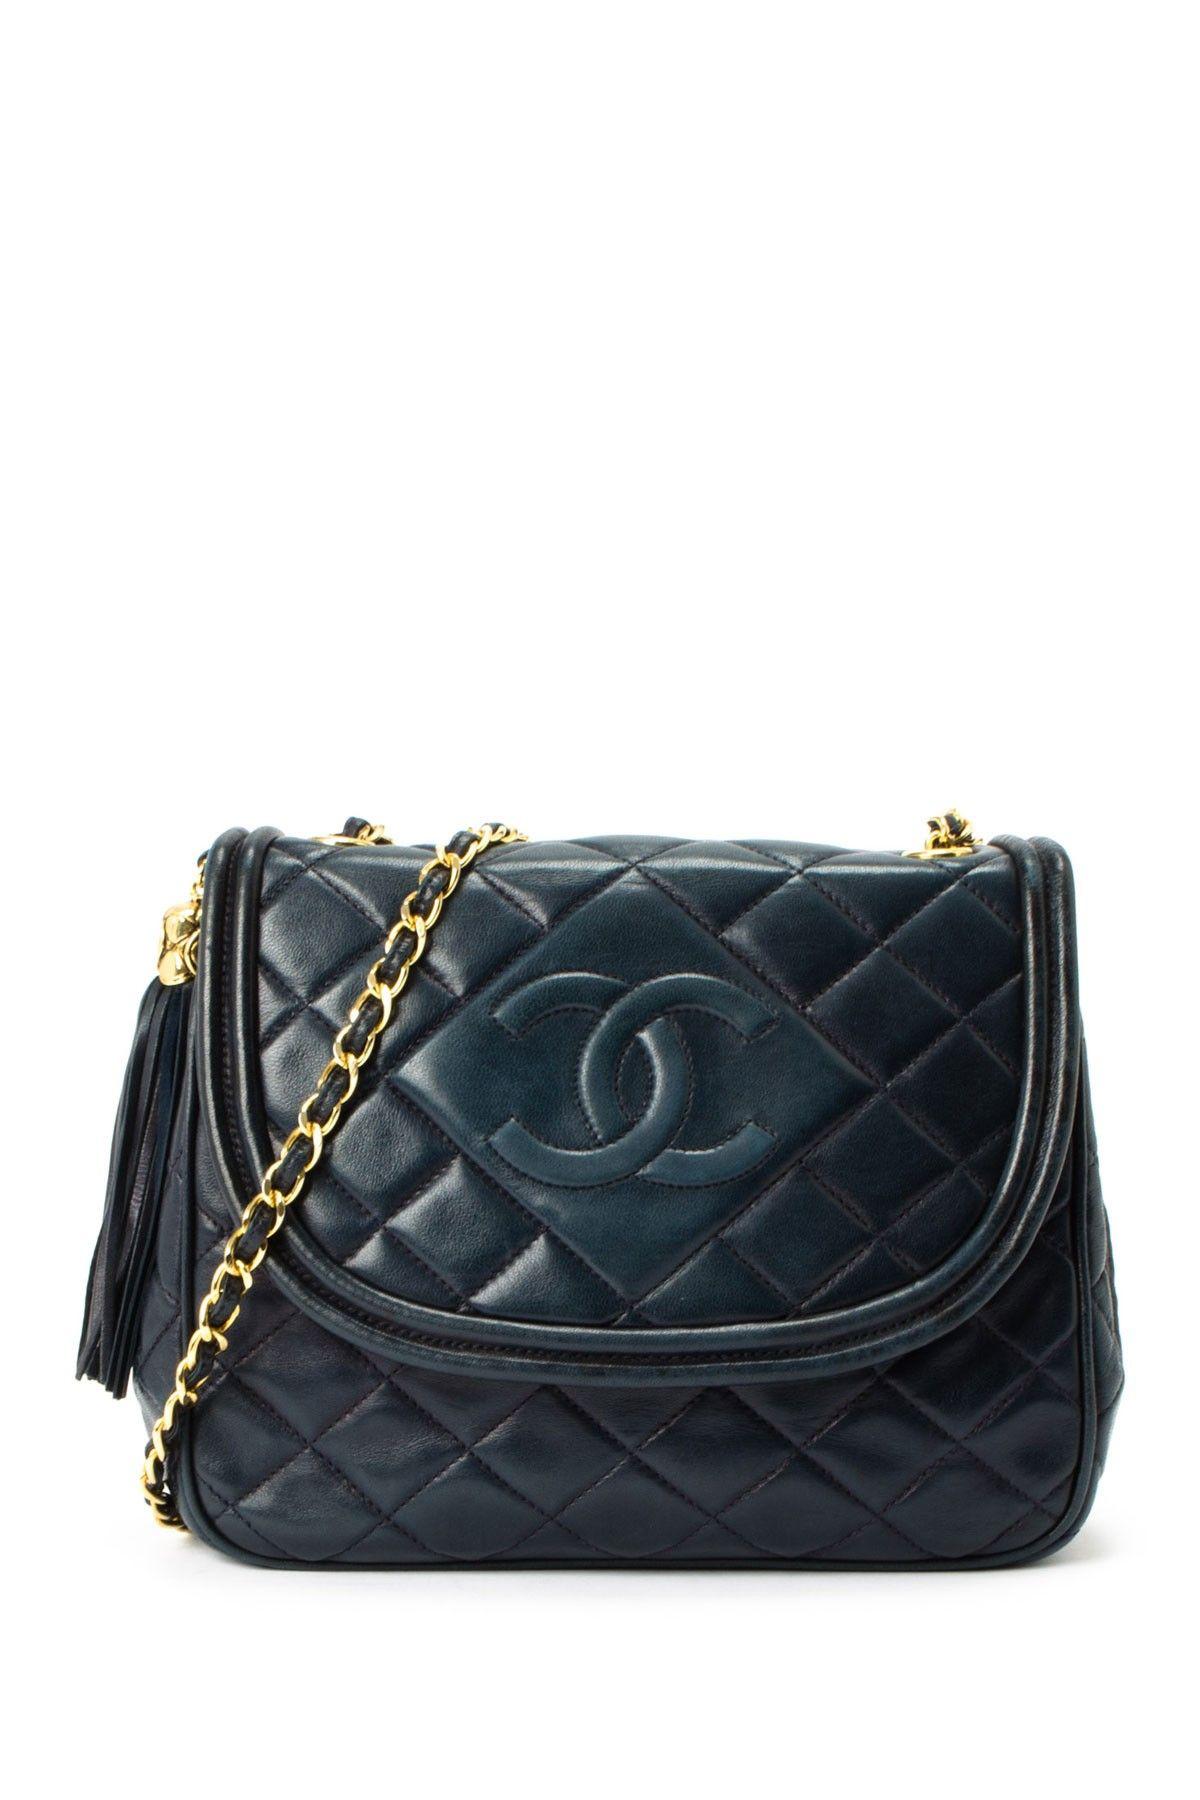 for sale handbags Vintage